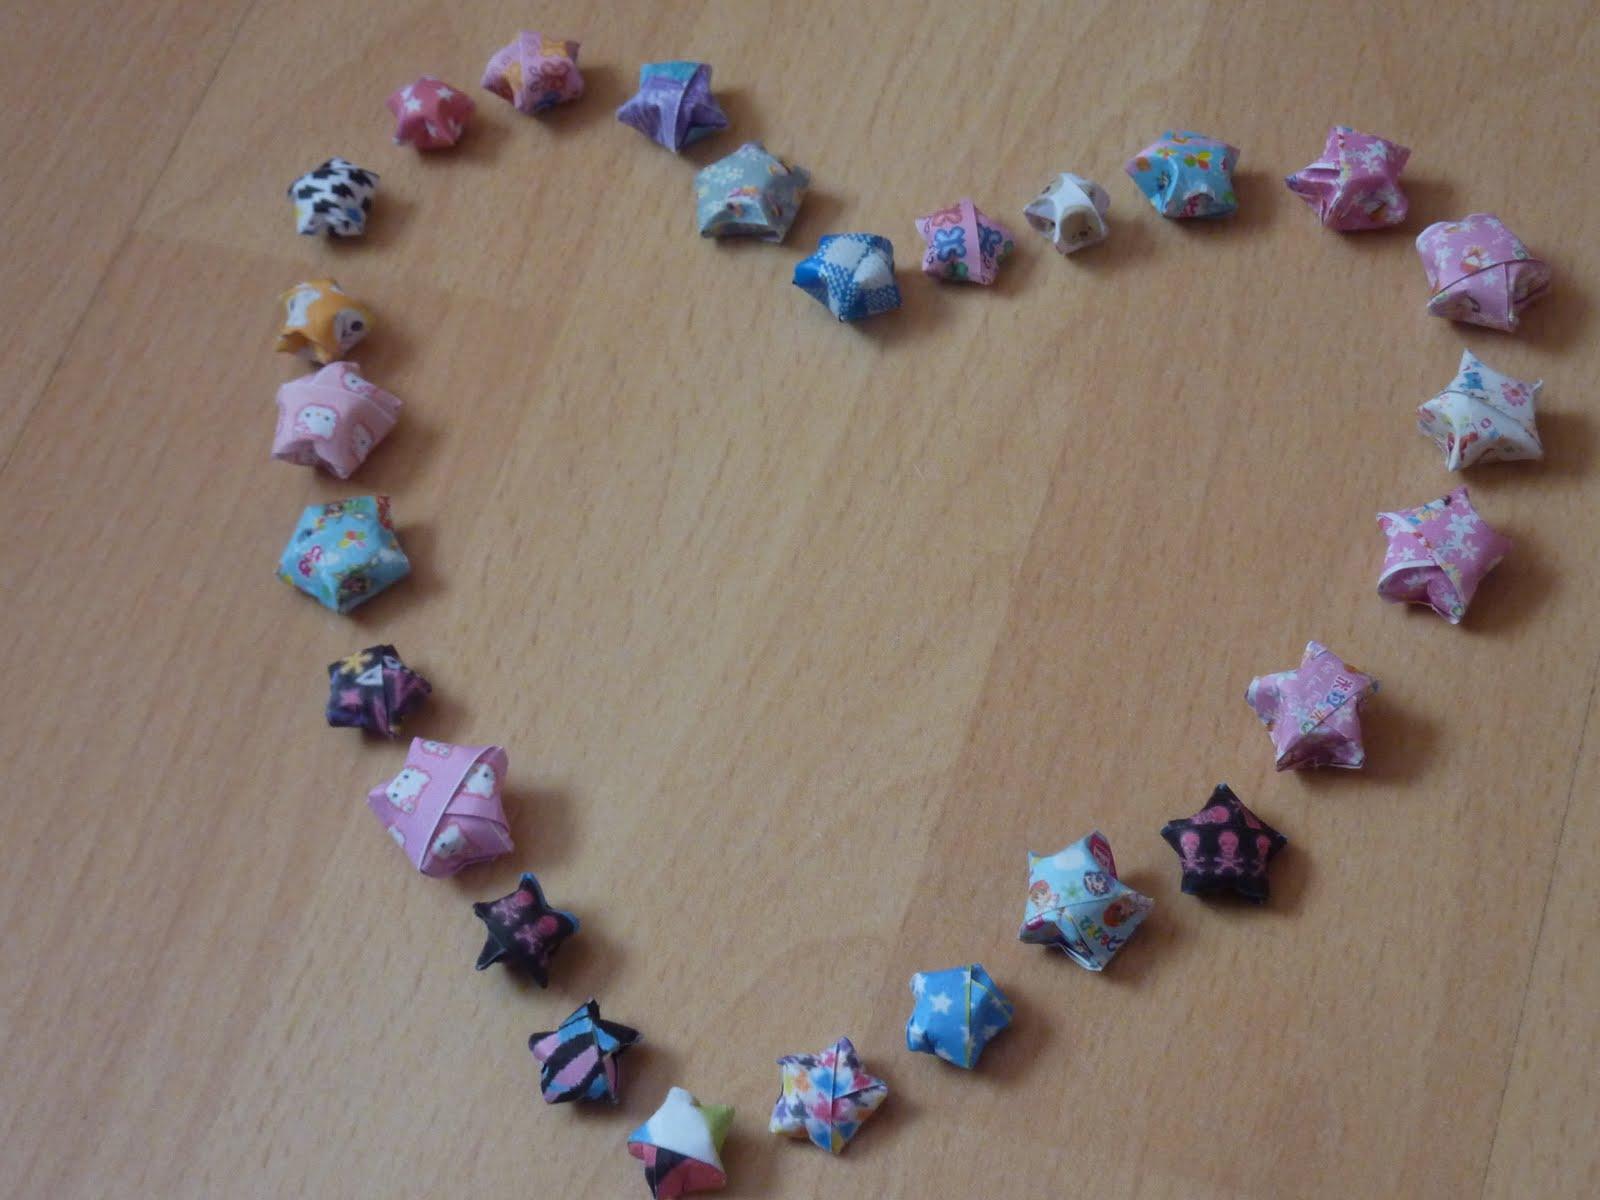 Nailpolishtheluxe diy lucky paper stars for Diy lucky stars